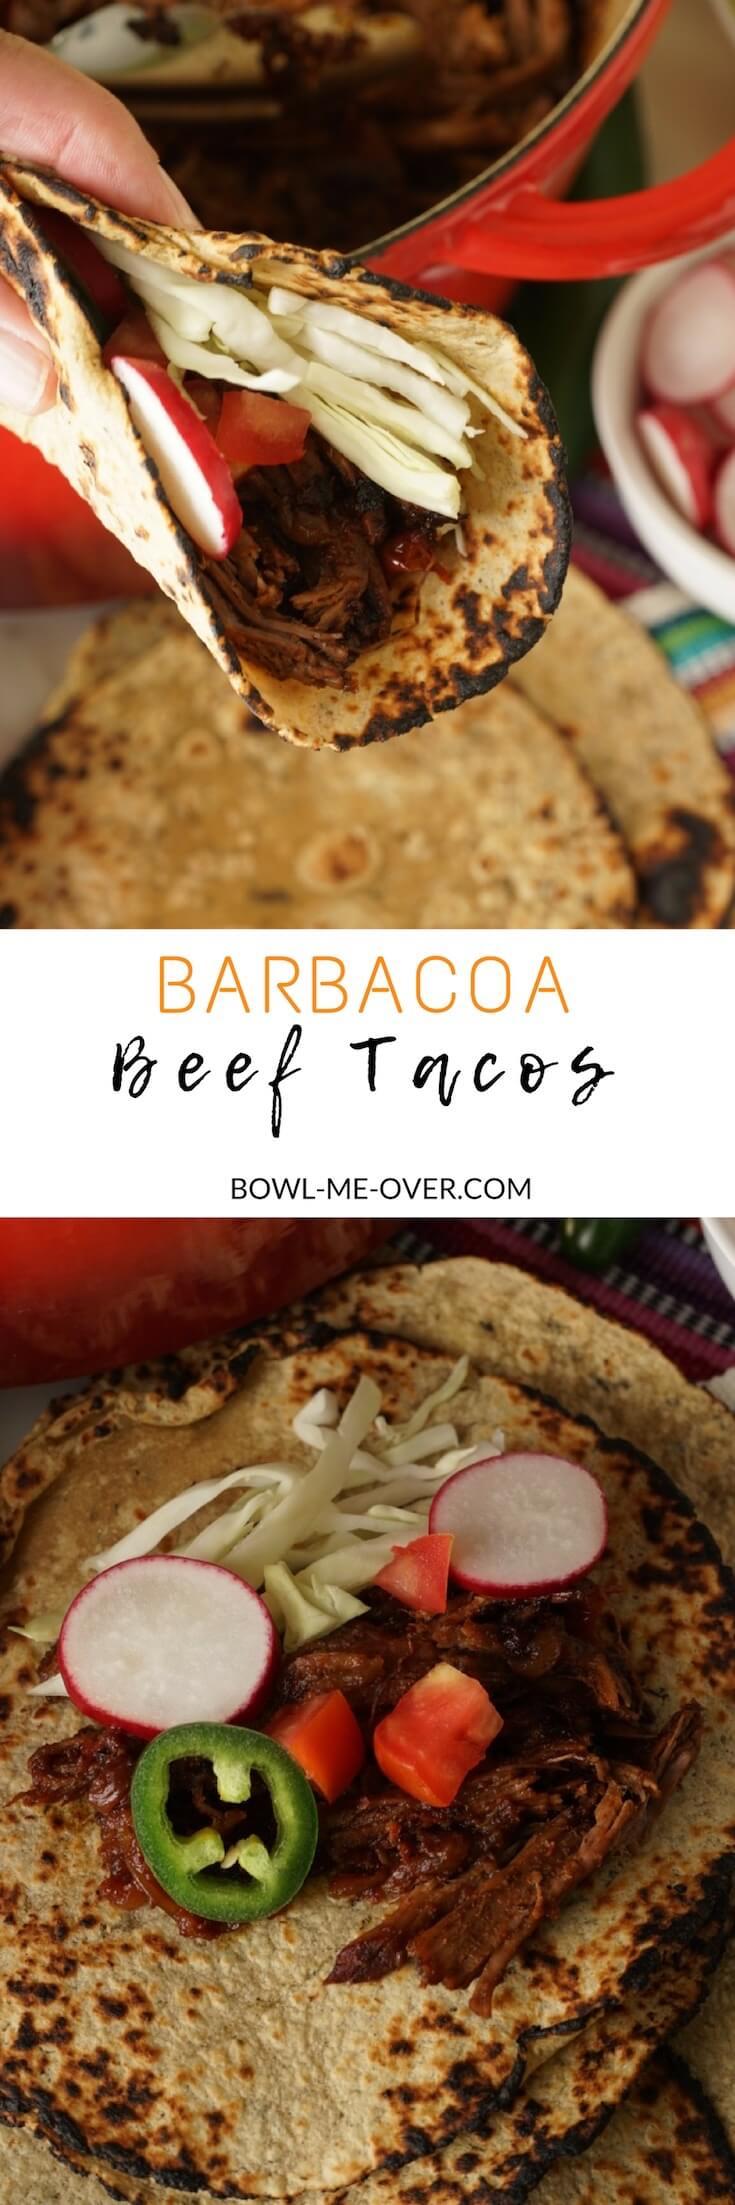 Easy Barbacoa Beef Tacos